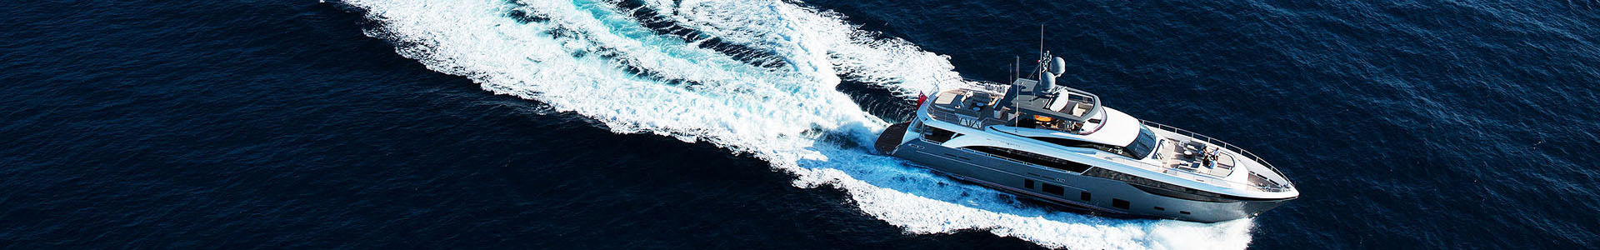 Croatia Catamaran Charter